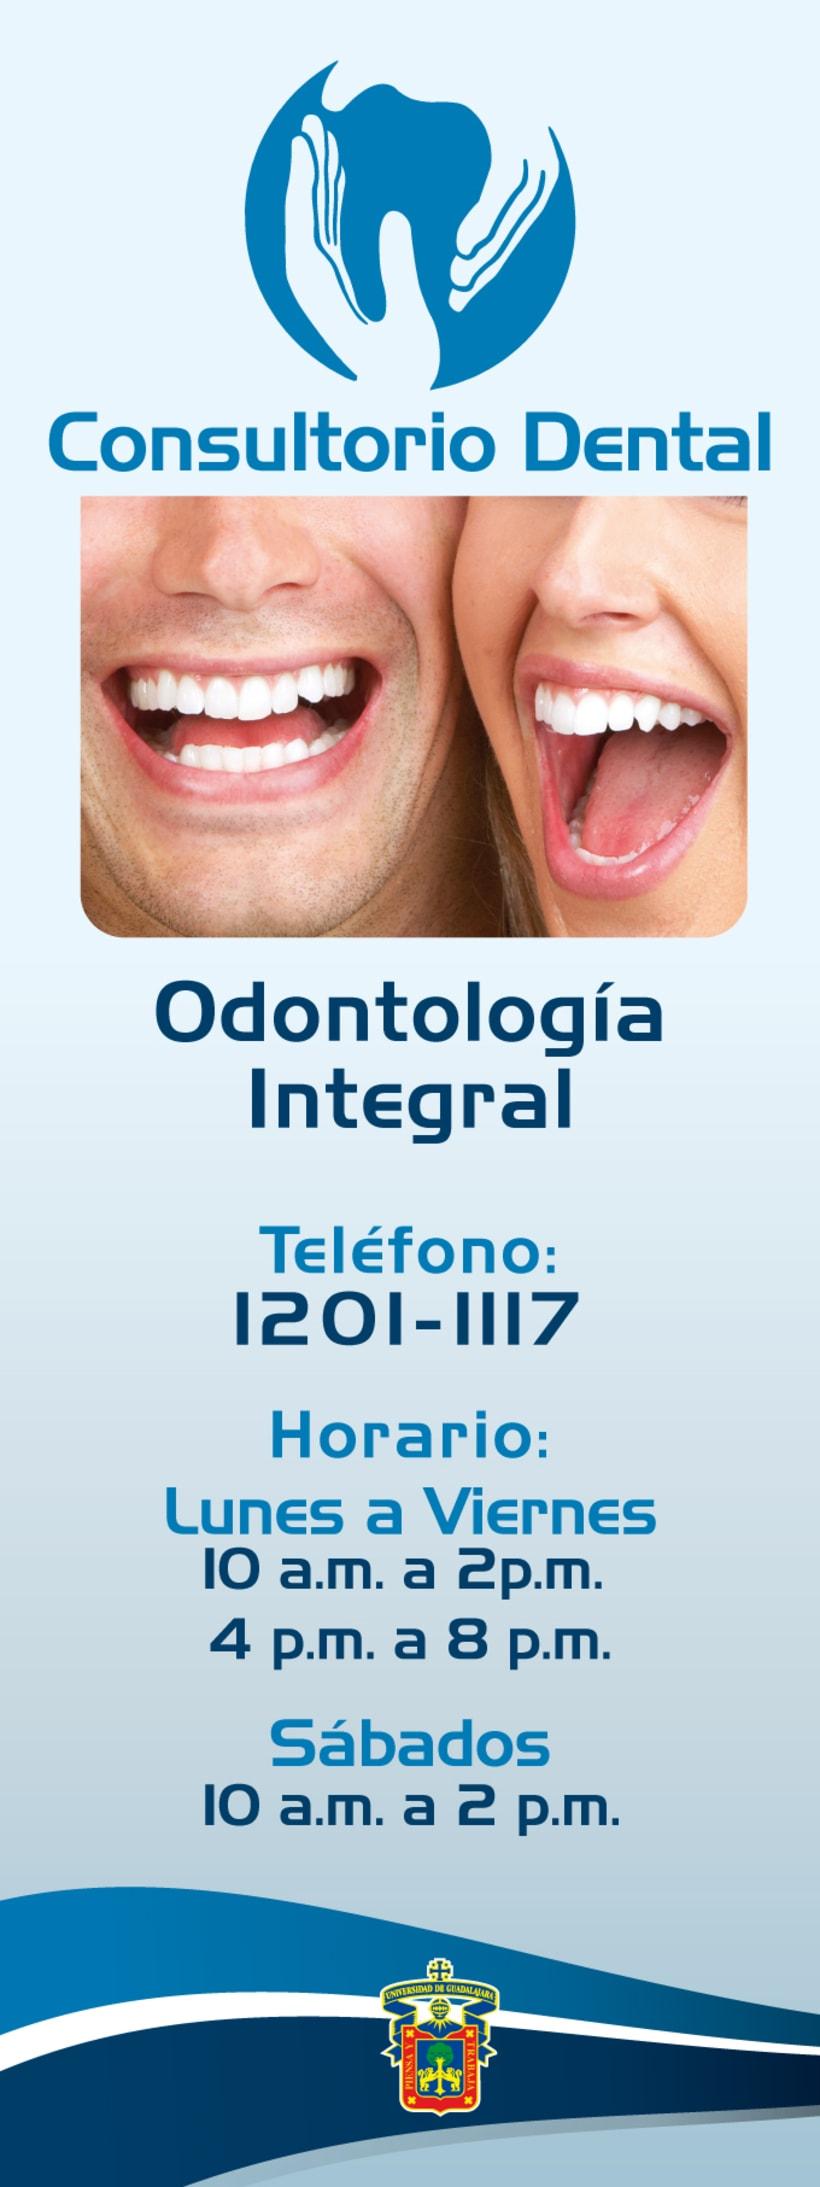 Consultorio Dental 1